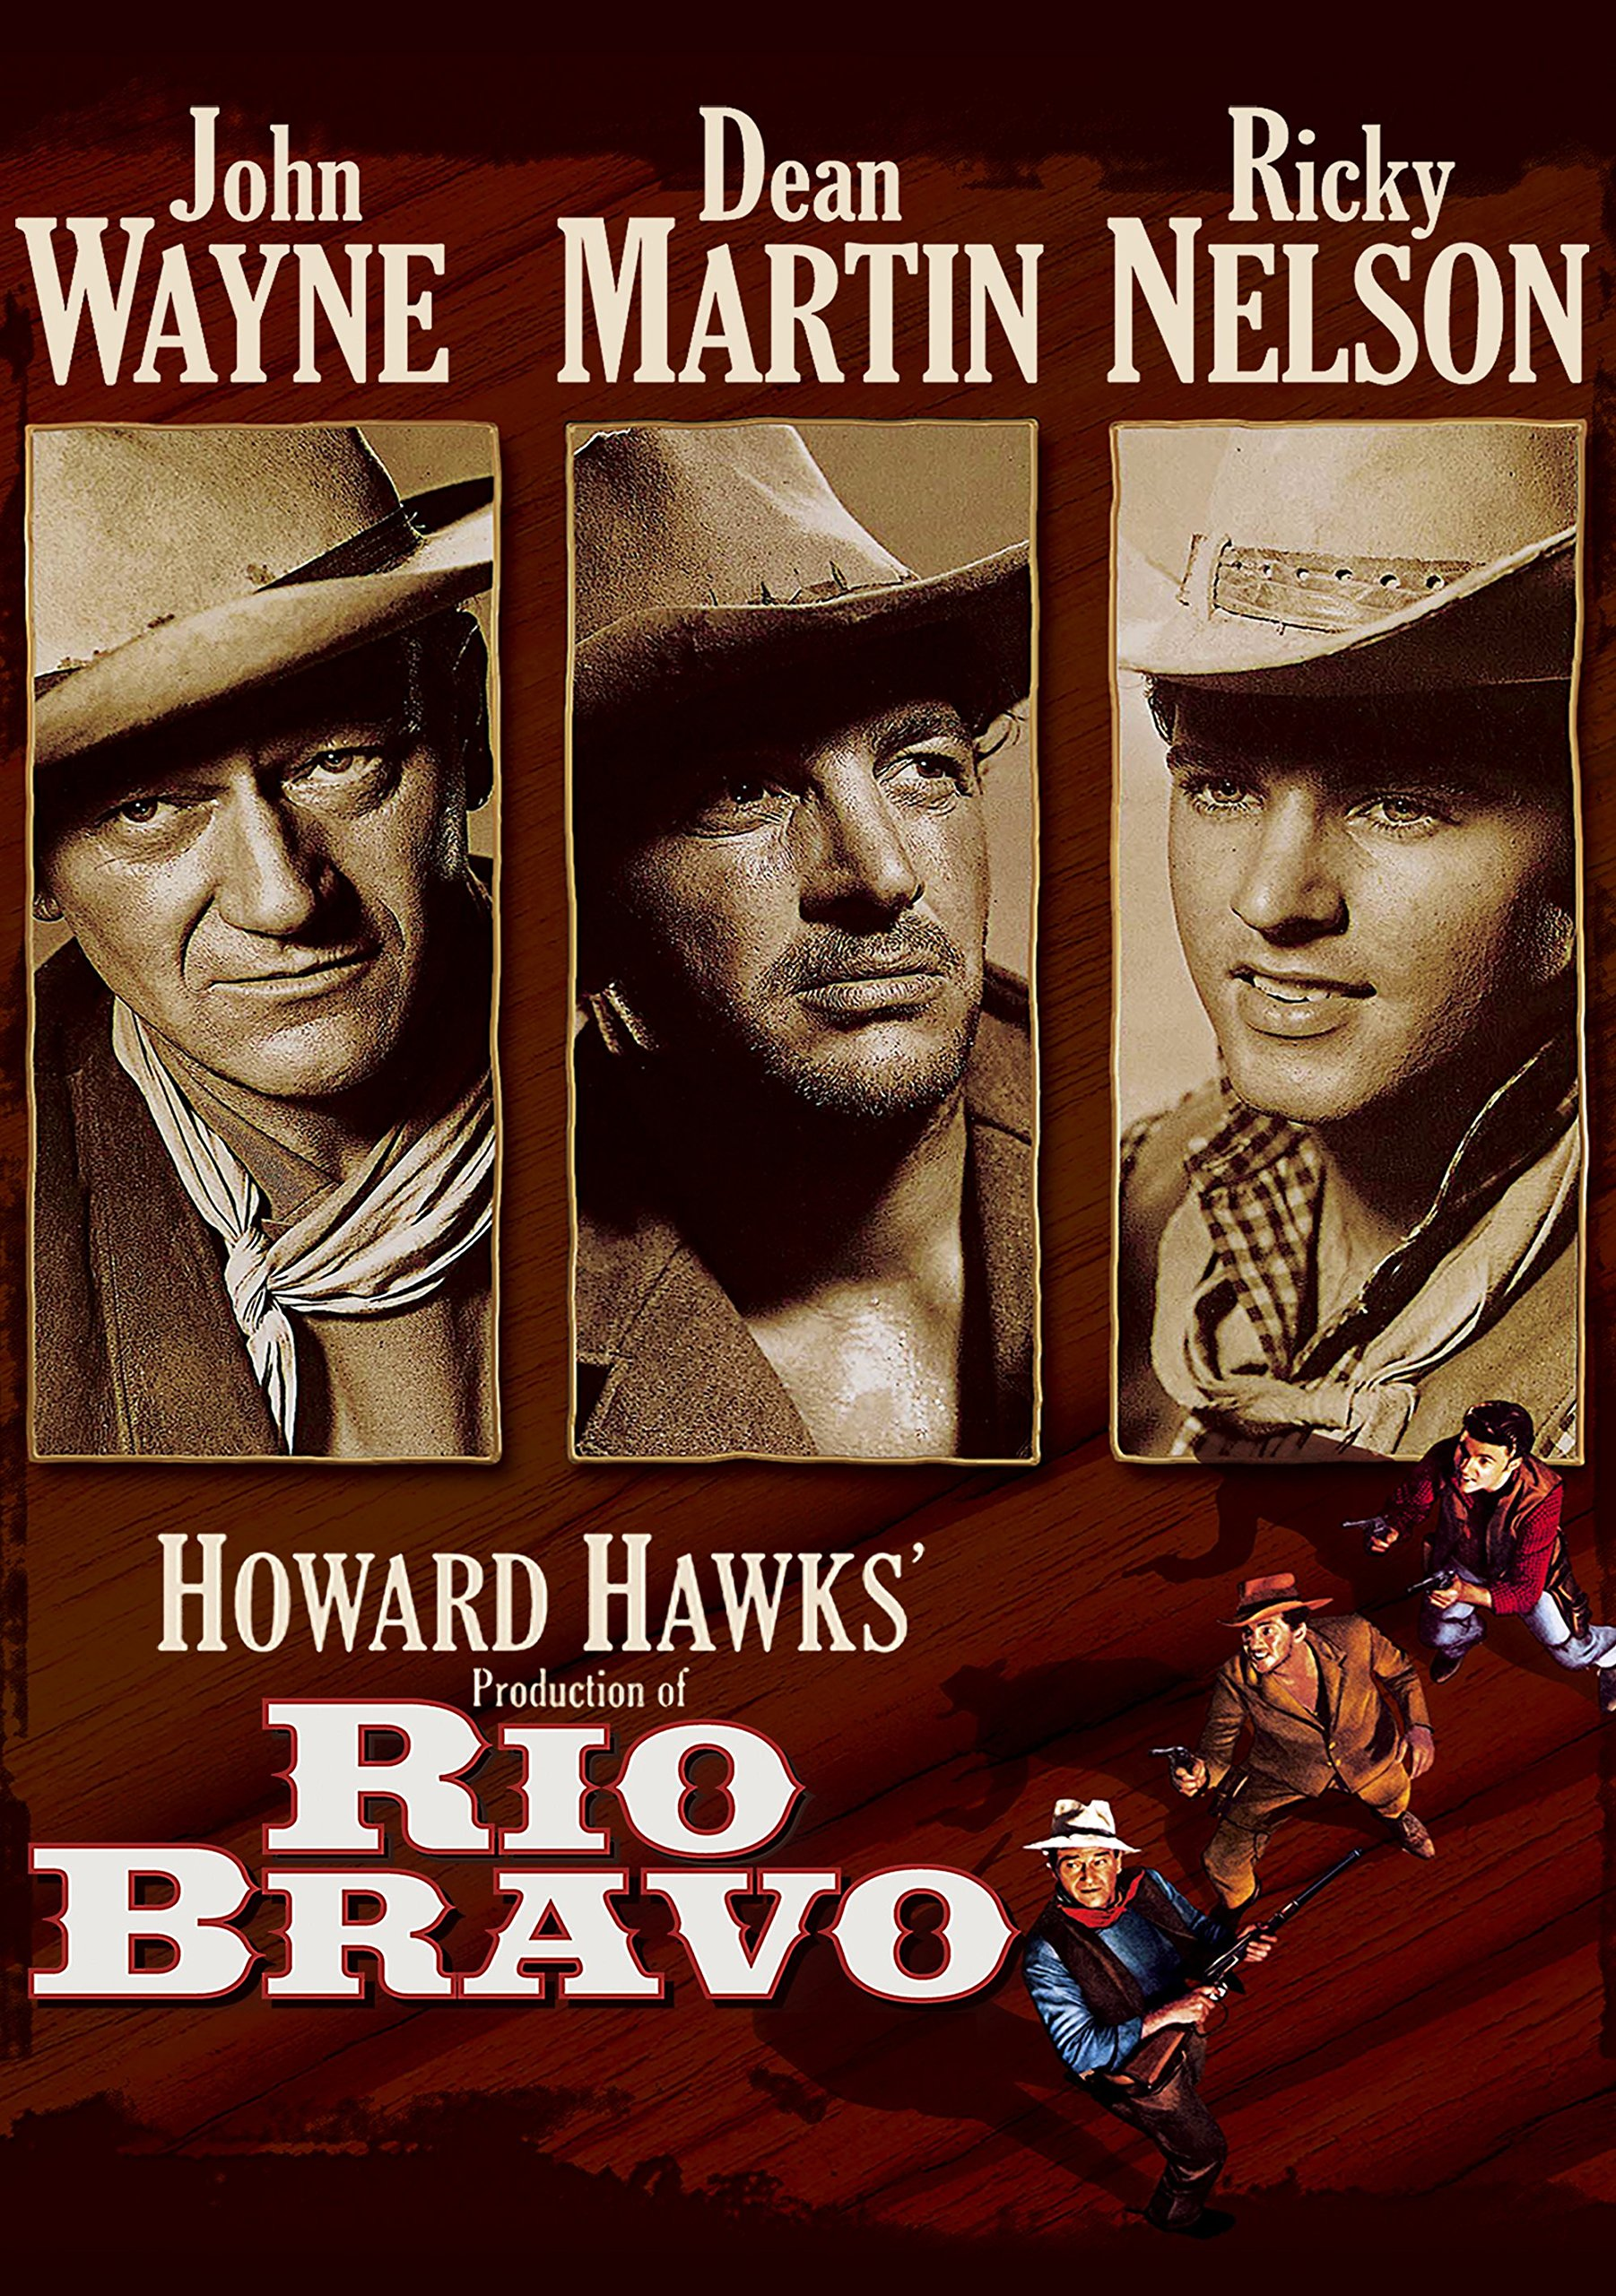 Amazon.com: Rio Bravo (1959): John Wayne, Dean Martin, Rick Nelson ...